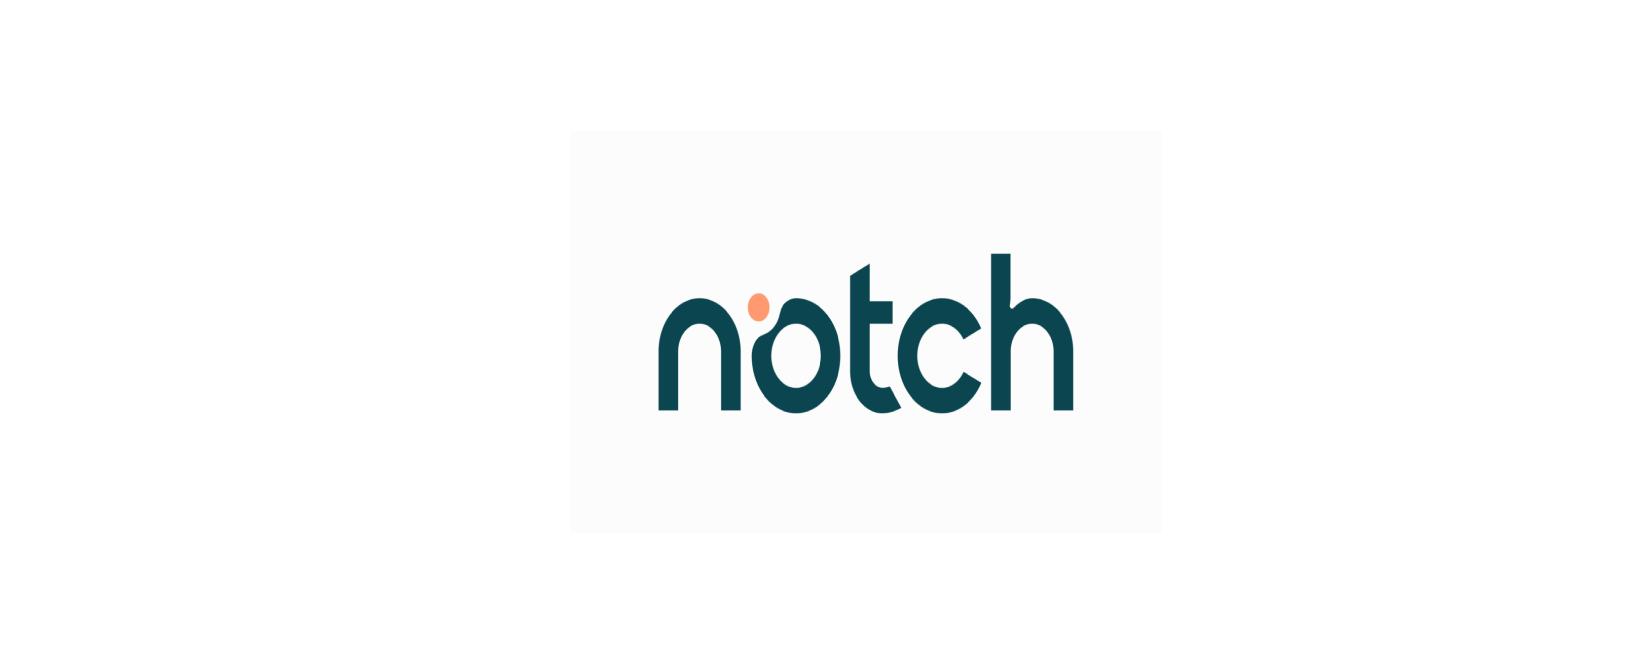 Notch Health Discount Code 2021